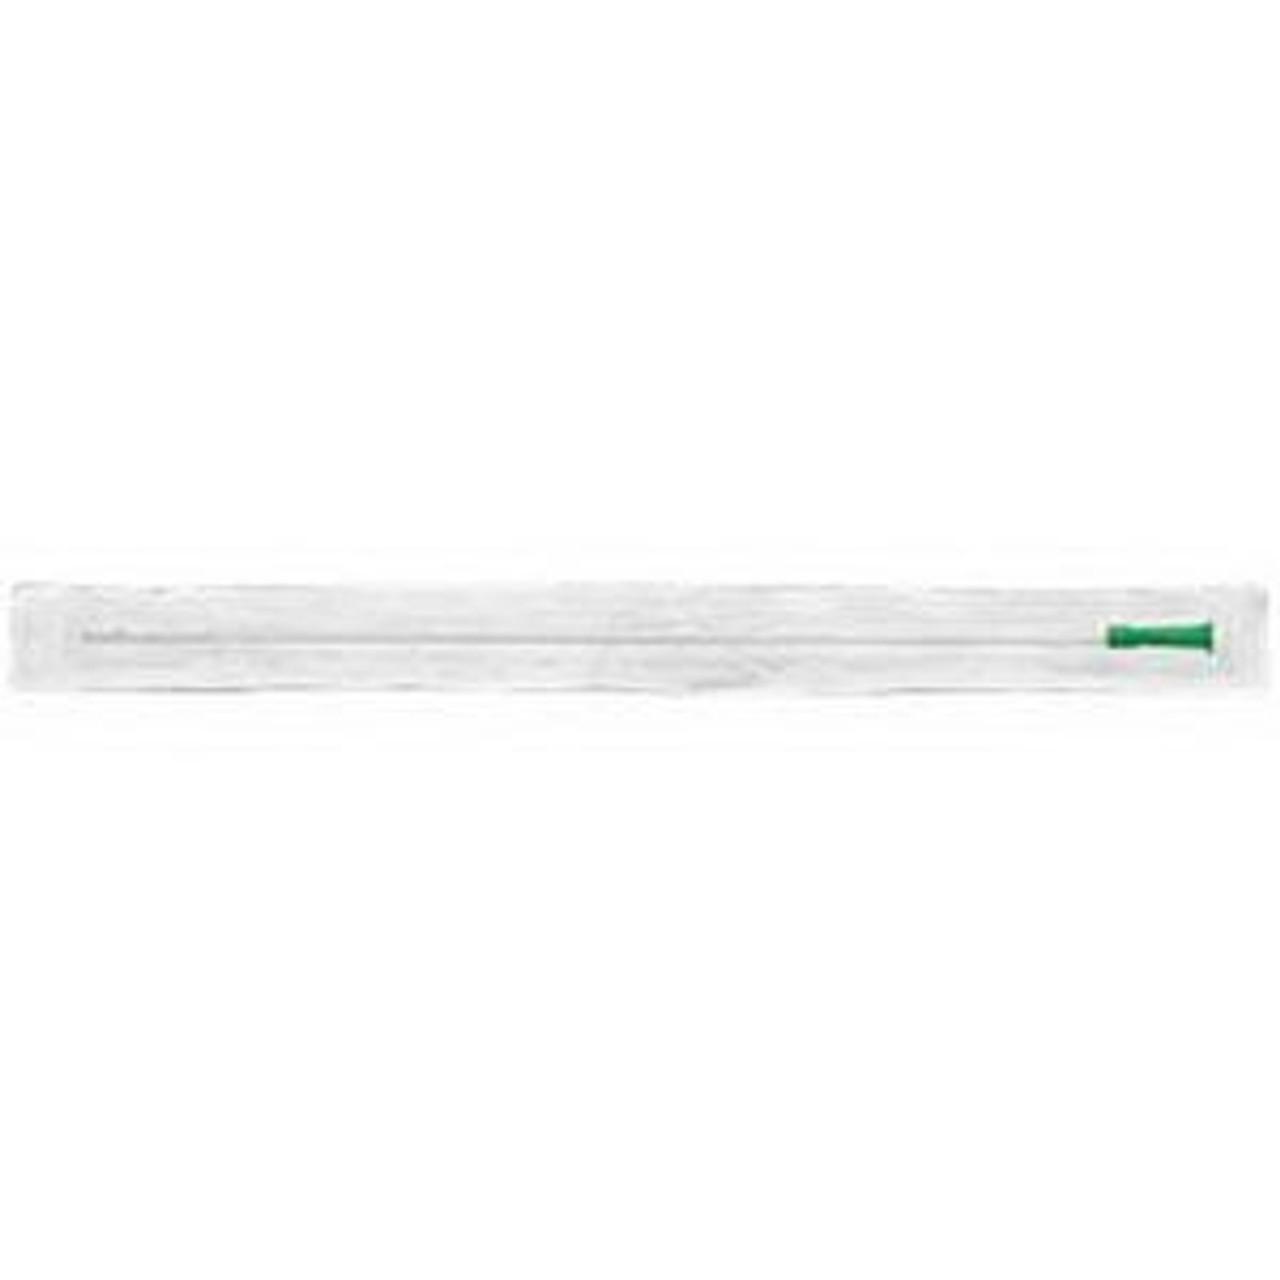 "Hollister Apogee Essentials Apogee IC Intermittent Catheter Soft - 16"""